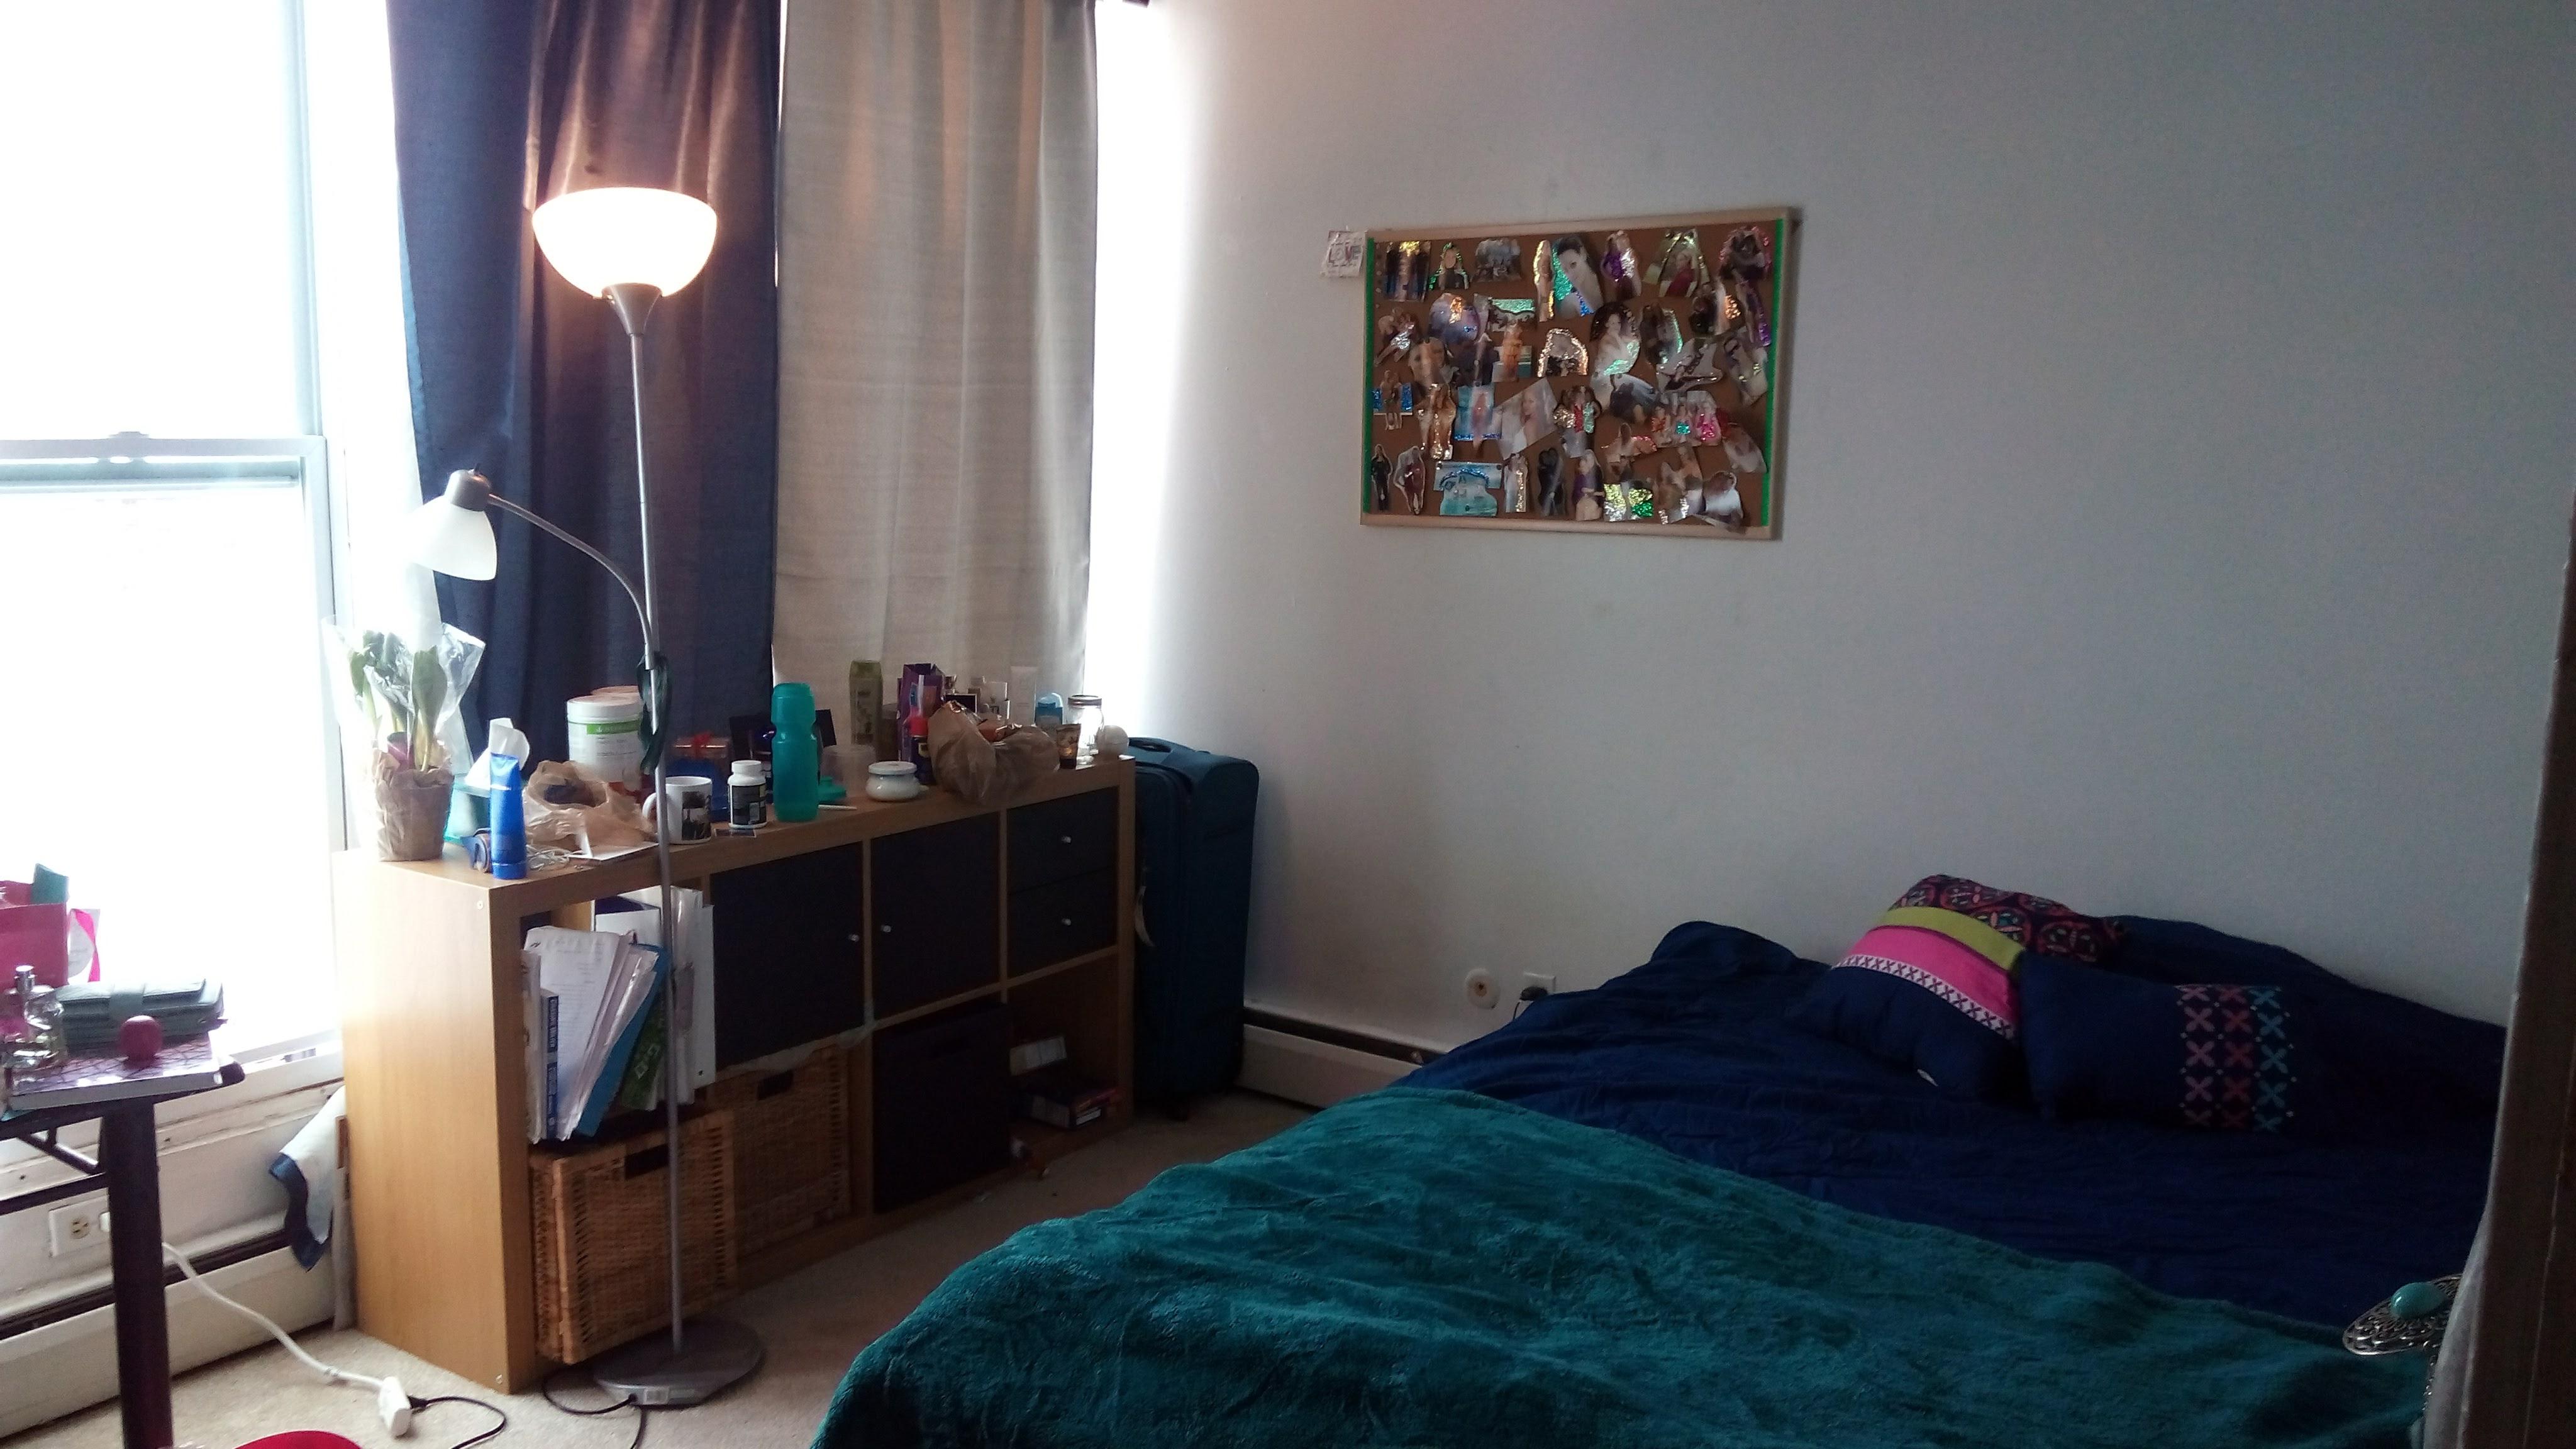 eastern-michigan-university off campus lofts